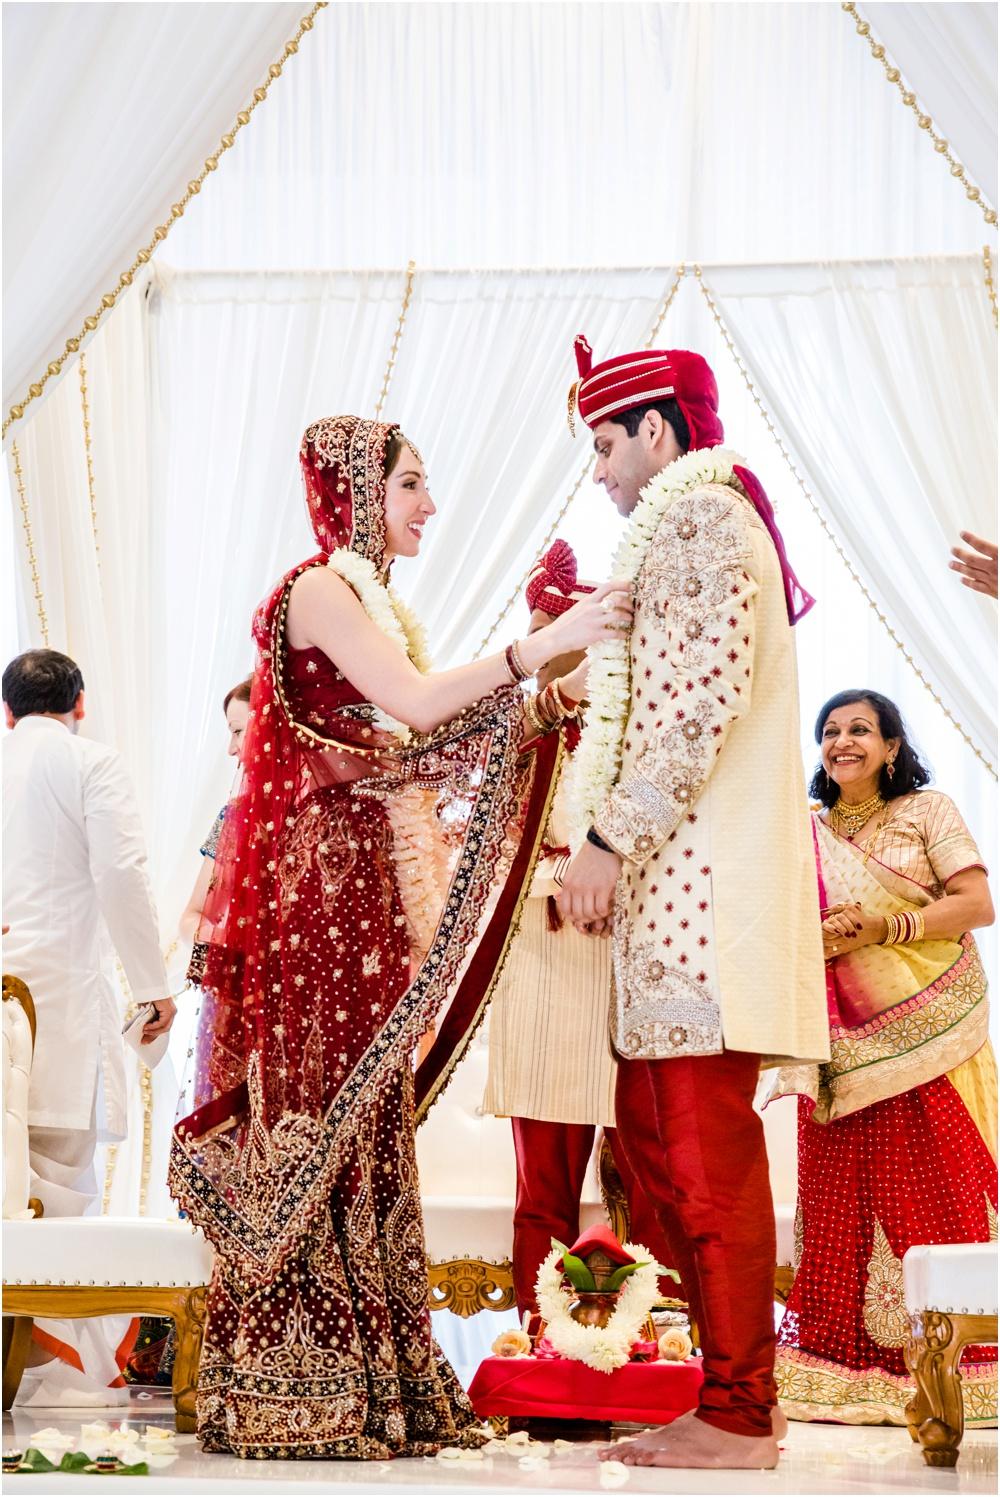 RI-Wedding-Photographer-Lefebvre-Photo-Blog_2869.jpg